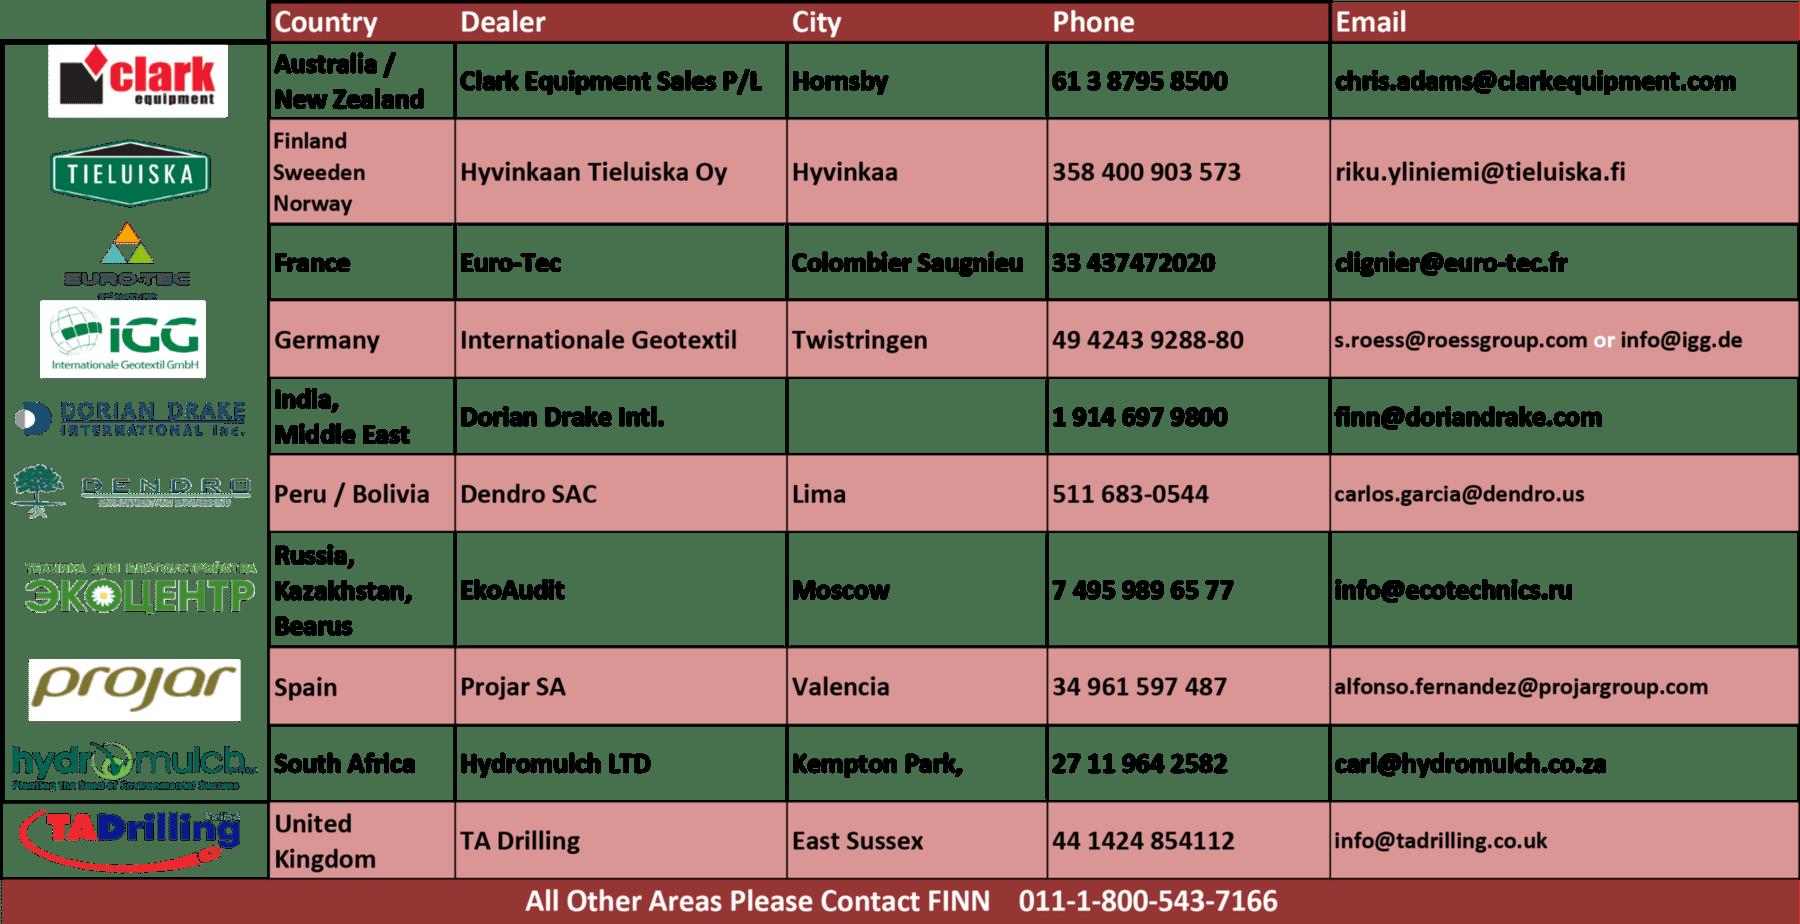 International FINN Dealer